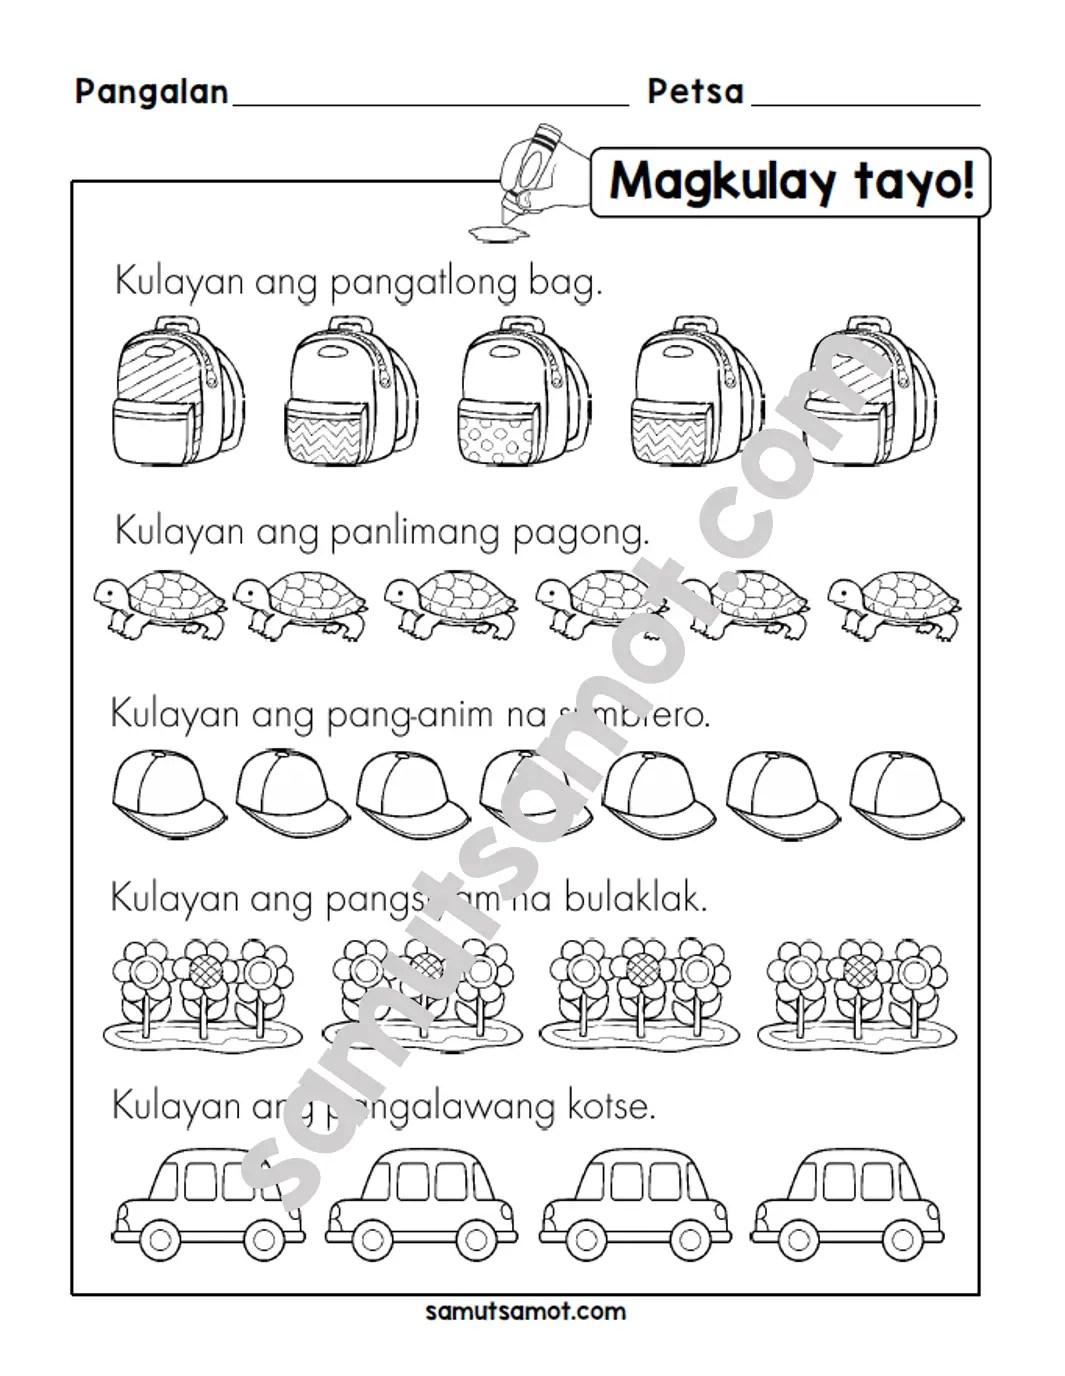 hight resolution of Mga Ordinal Worksheets - Samut-samot